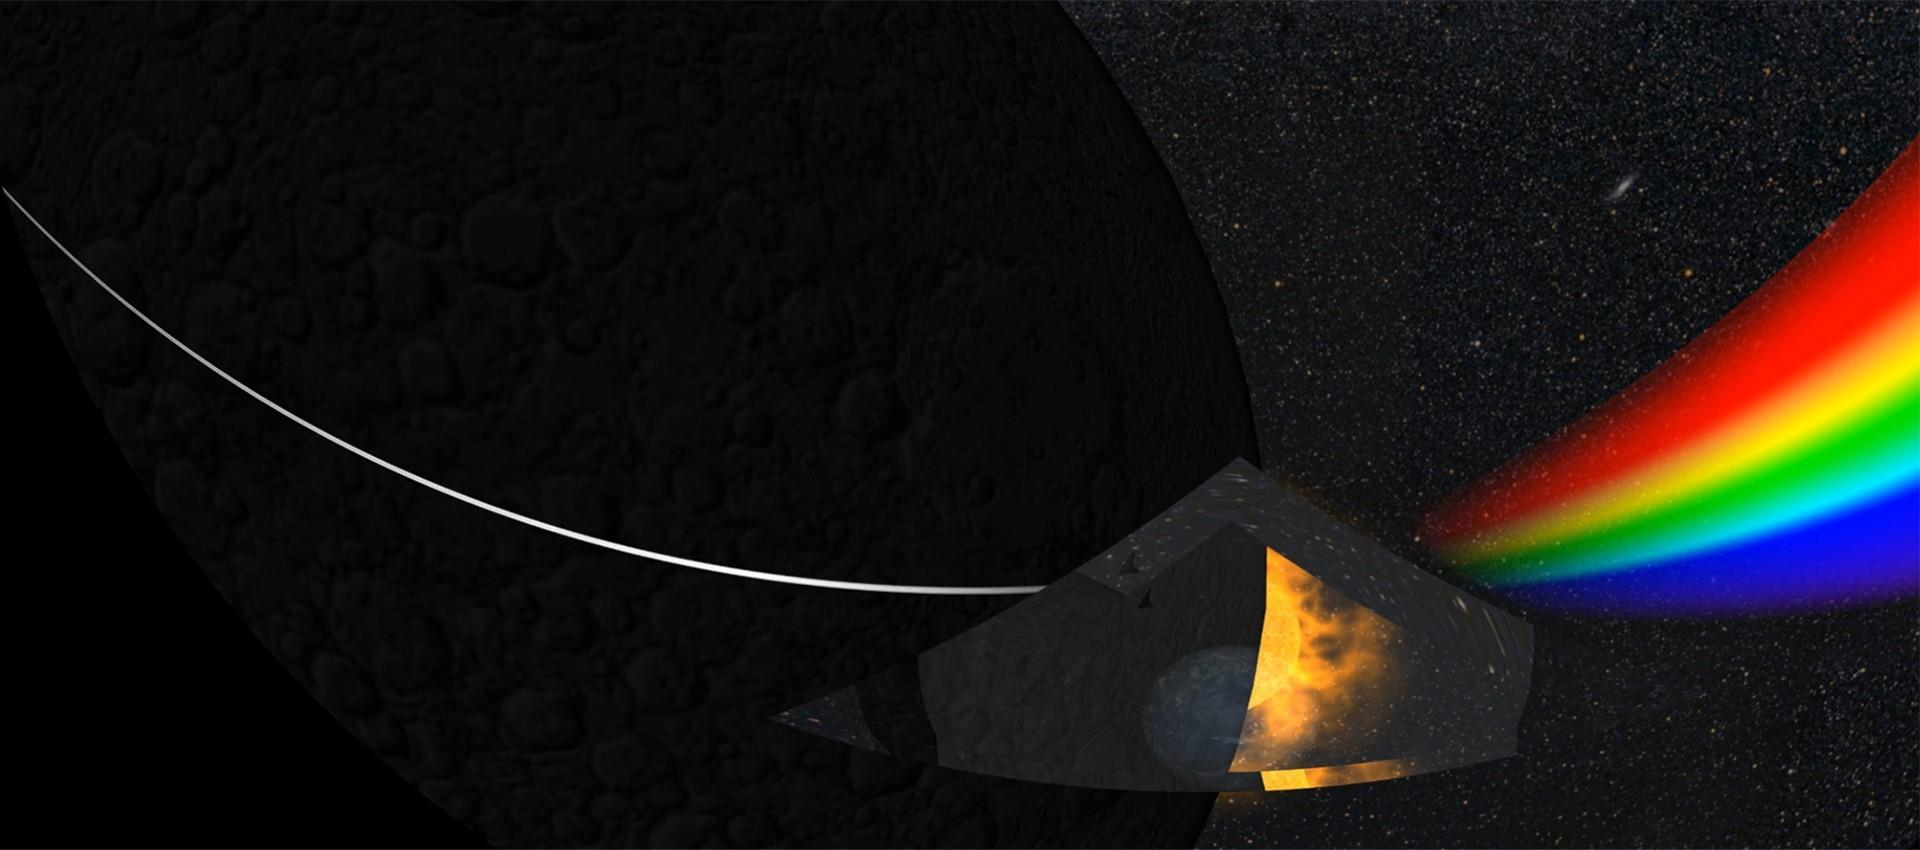 Nowy pokaz Pink Floyd w Planetarium EC1